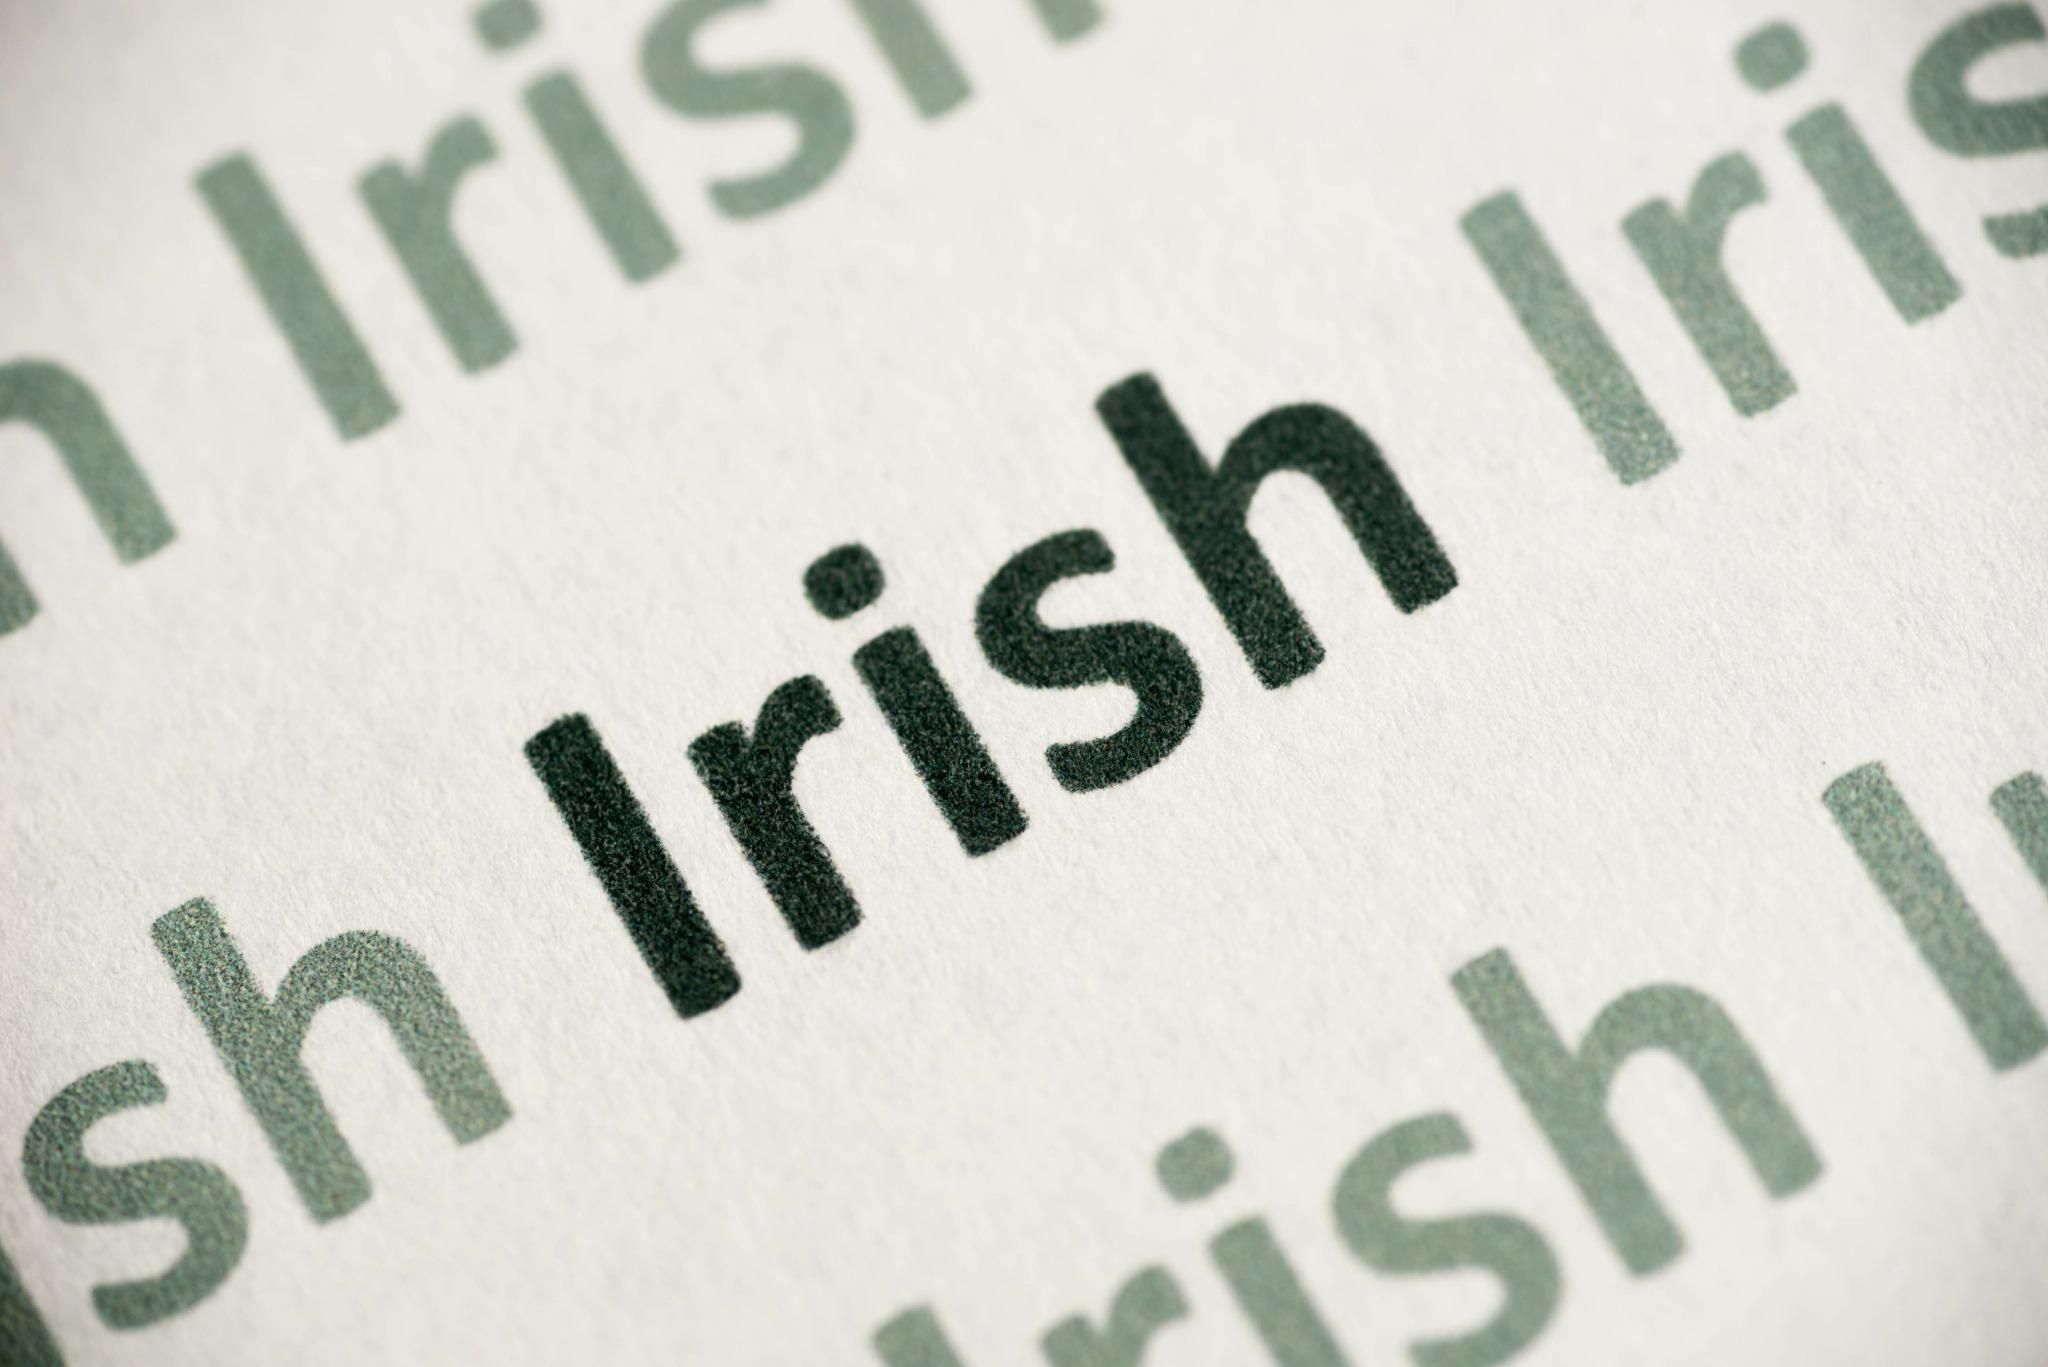 The word Irish written in green many times.